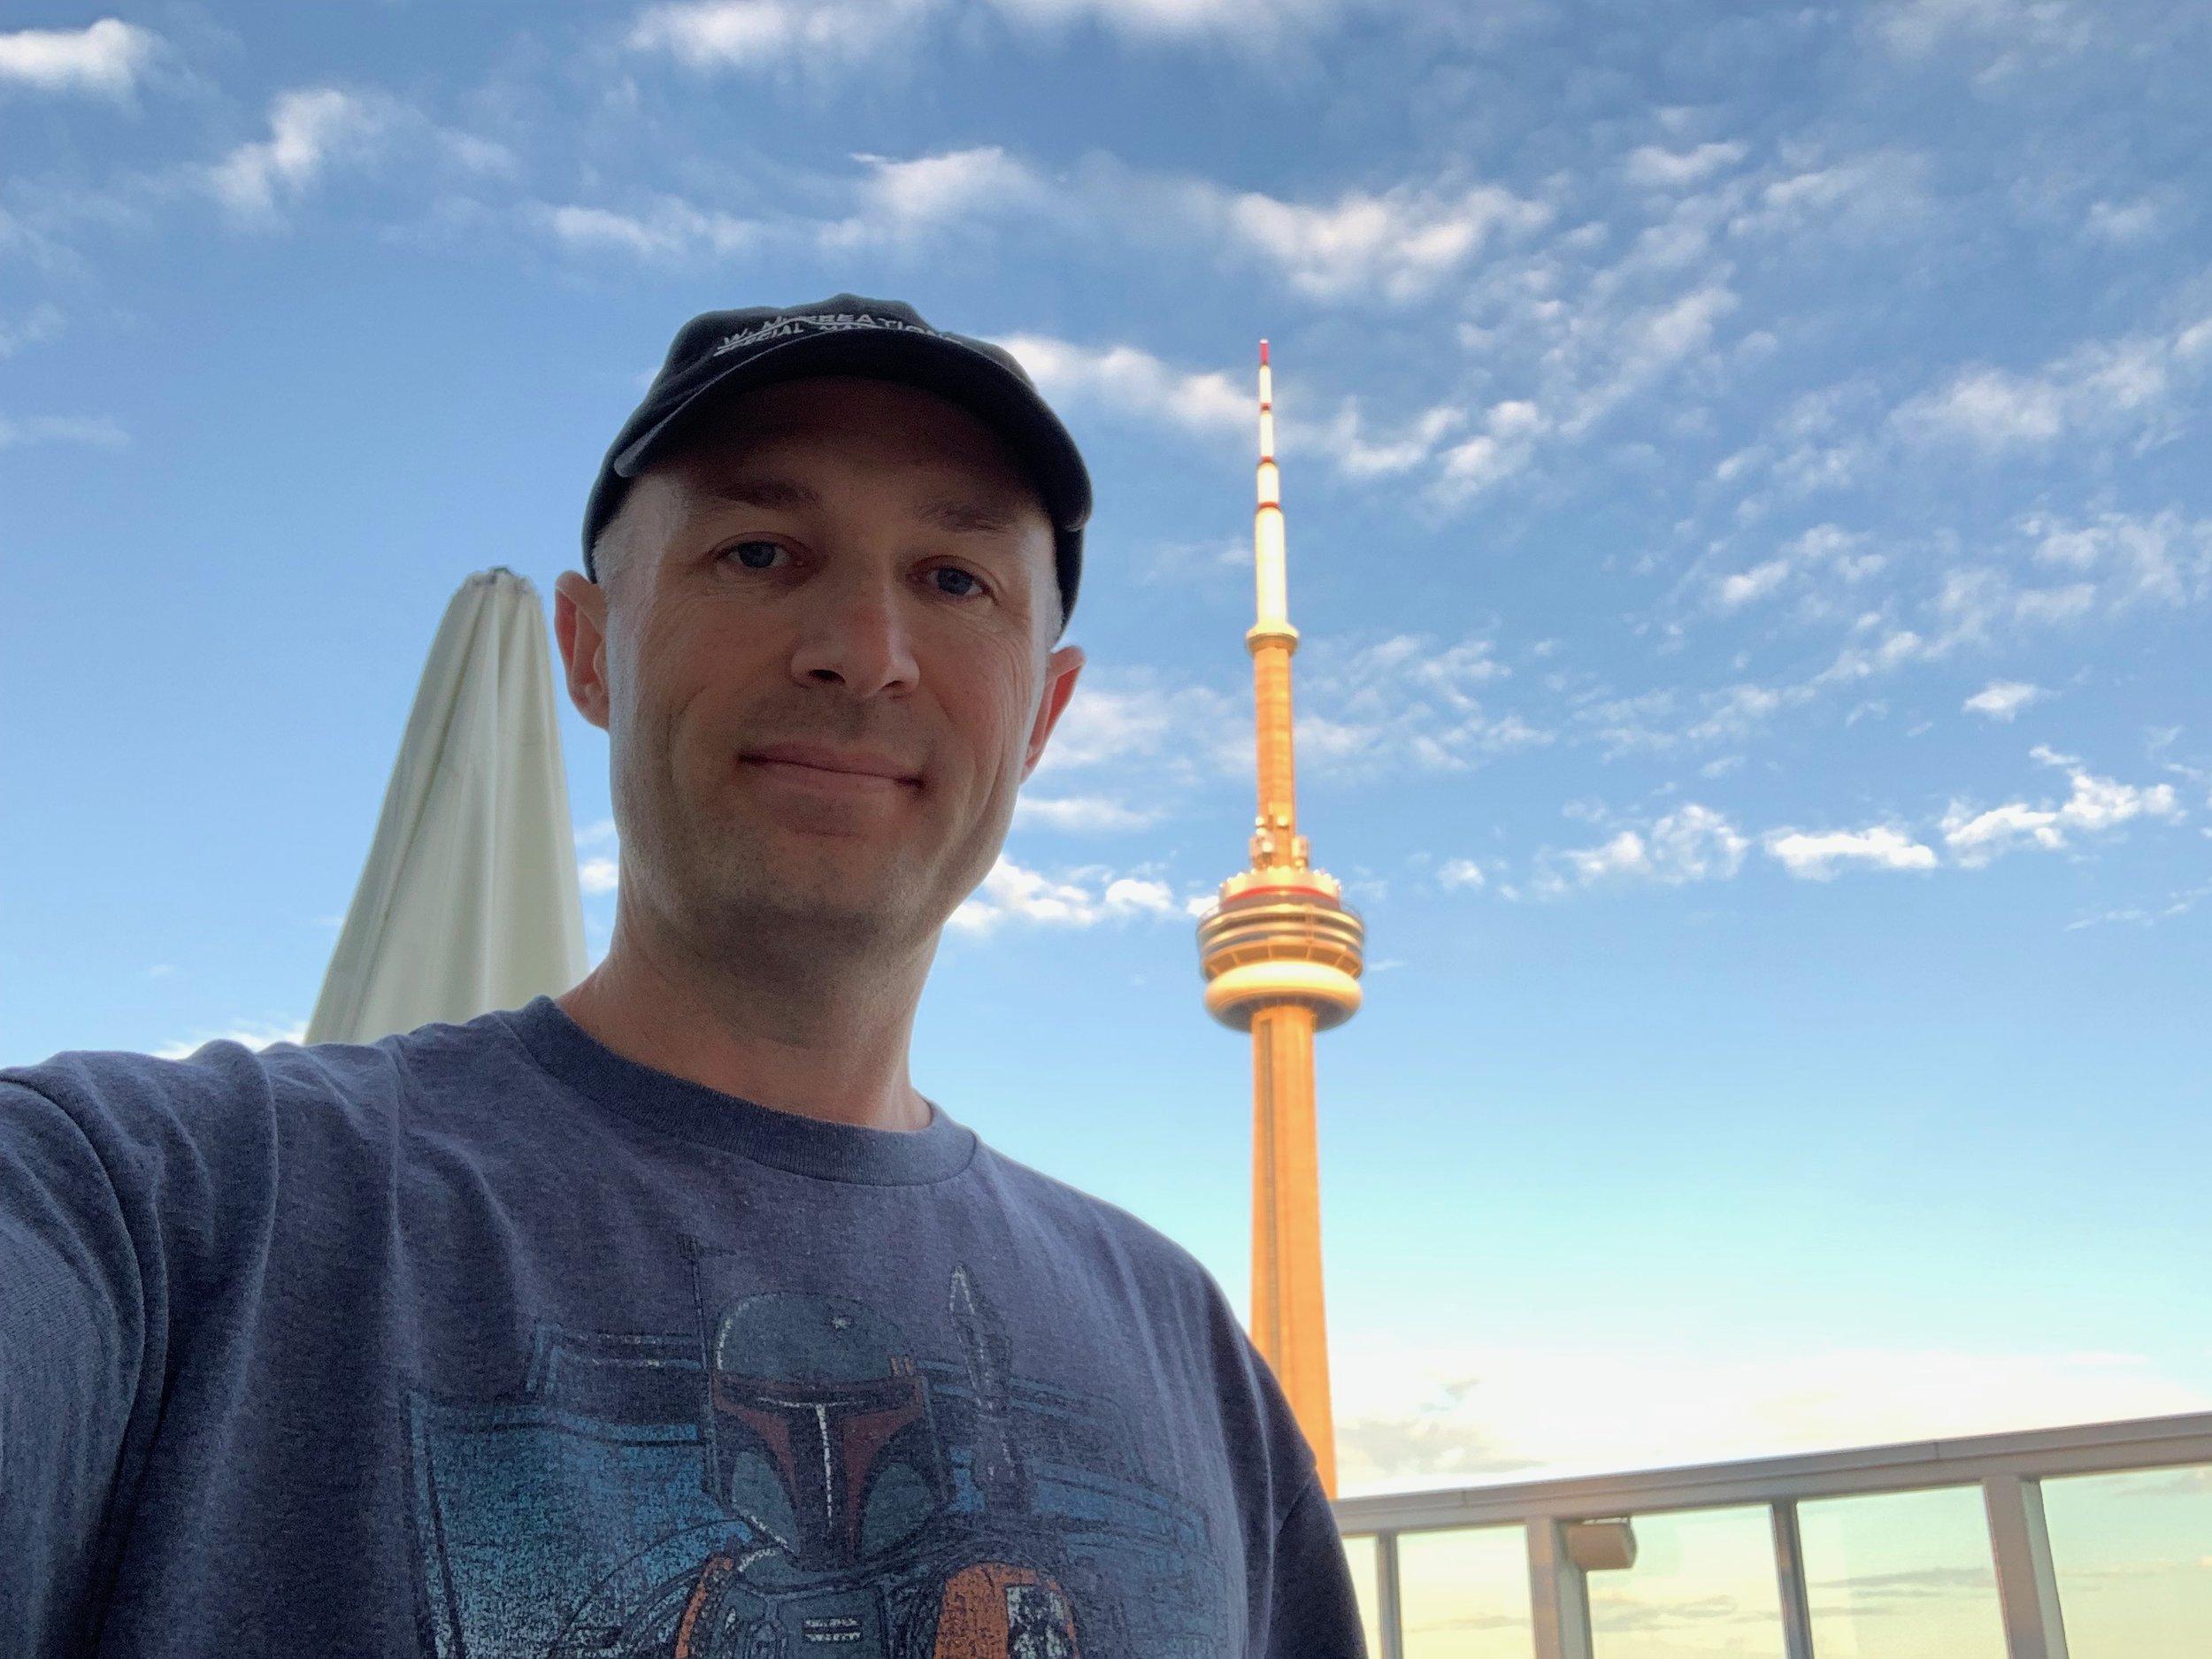 Toronto, Ontario - June 2019